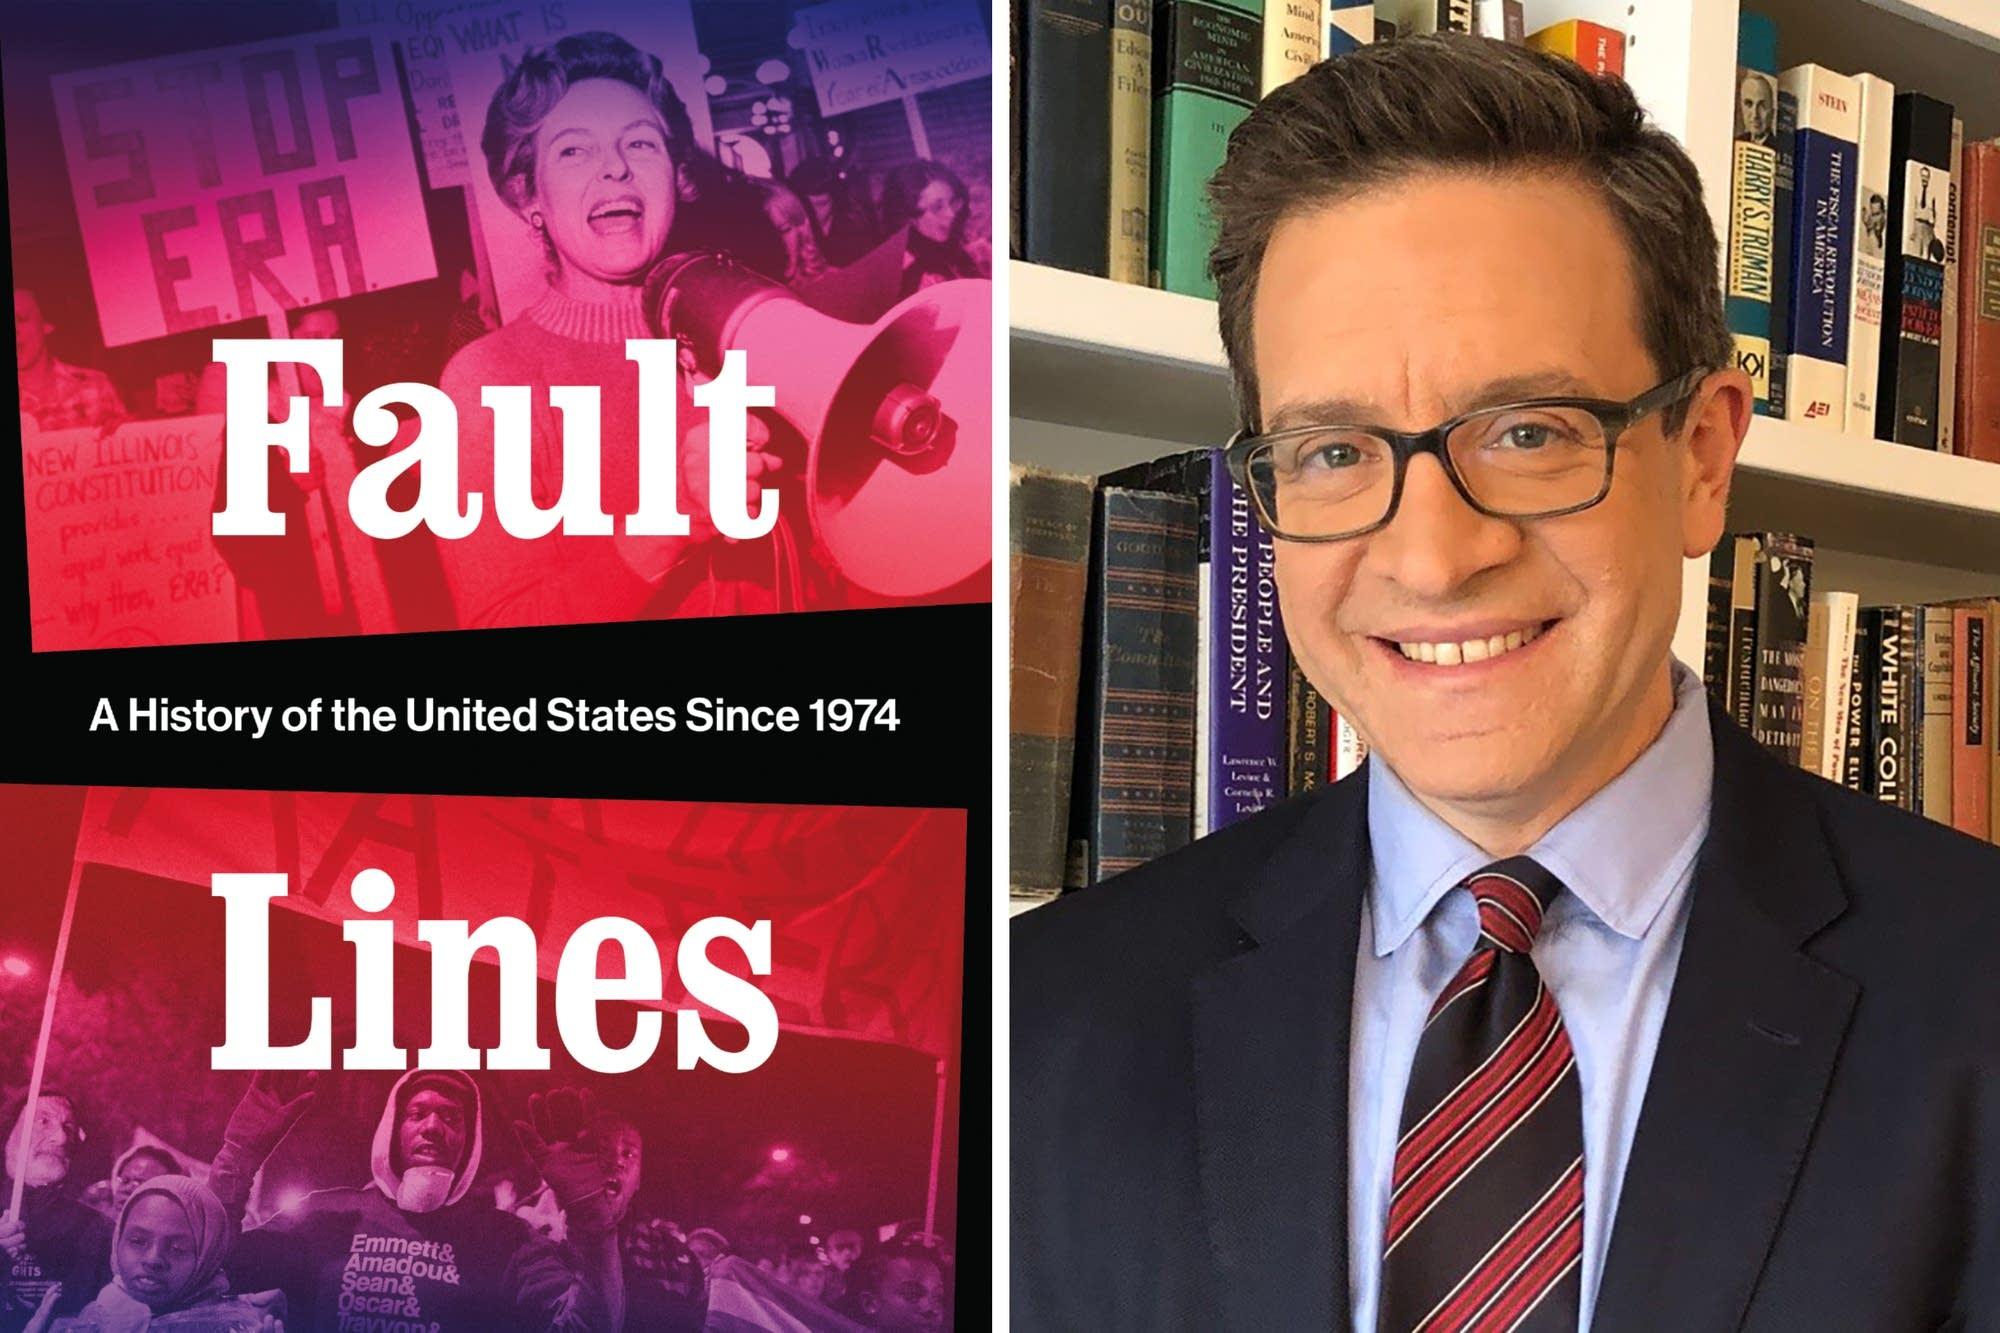 Princeton historian Julian Zelizer, author of 'Fault Lines'